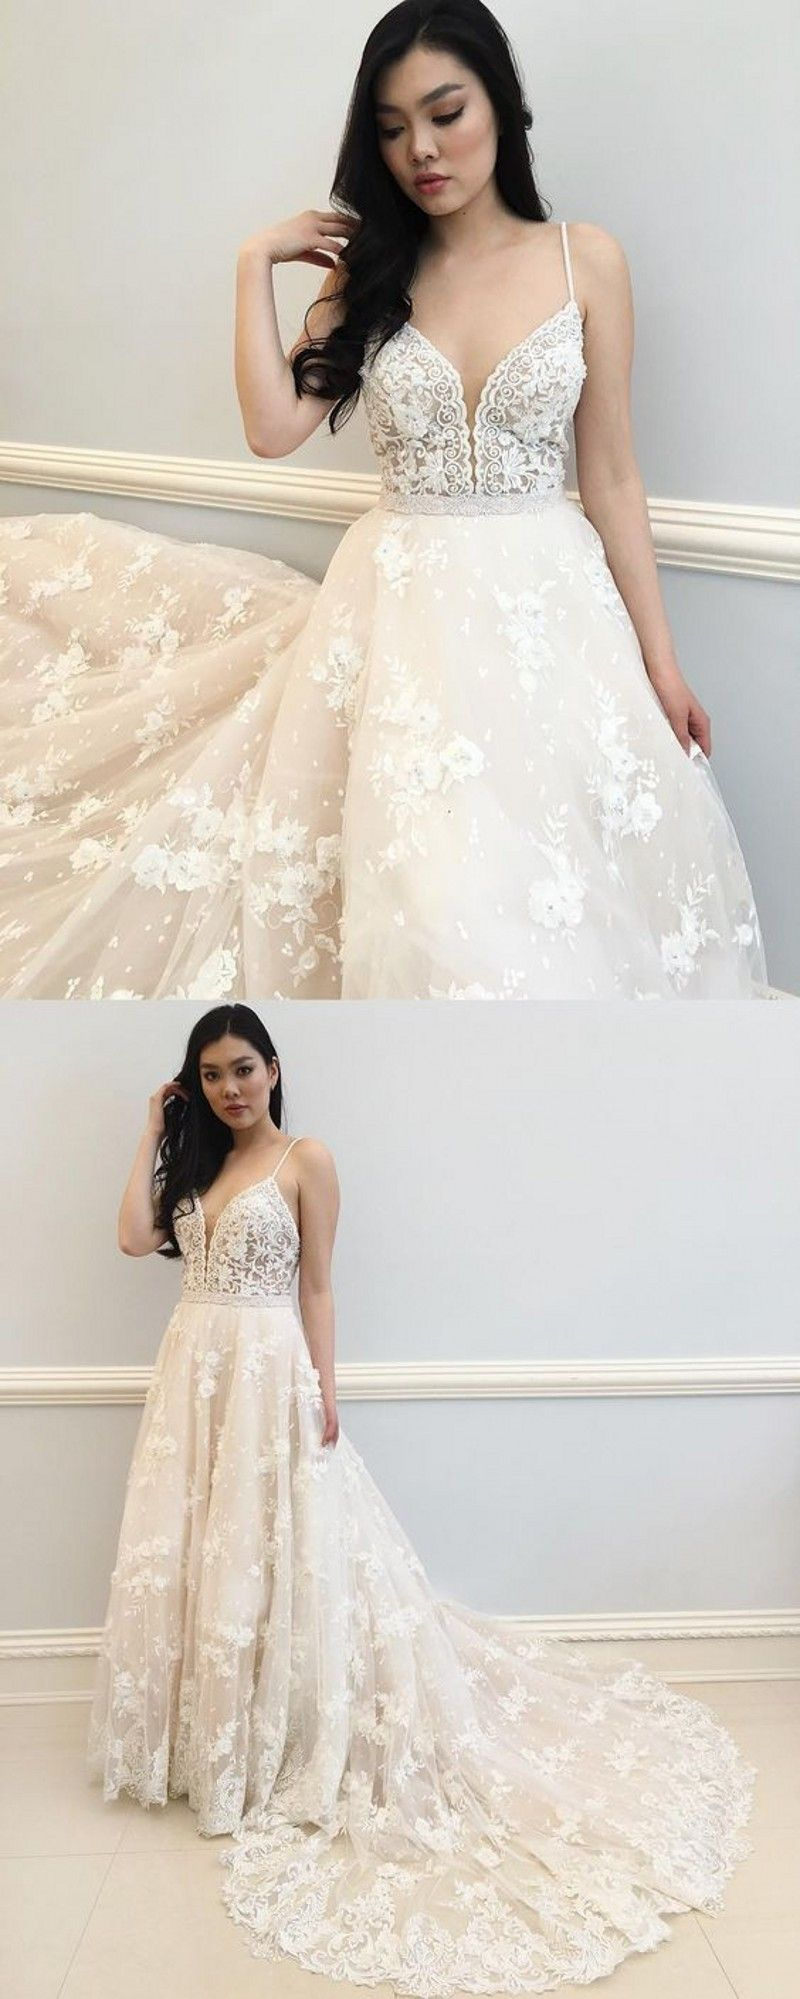 Wedding dress suit  colorful wedding dress  Wedding  Pinterest  Wedding dresses